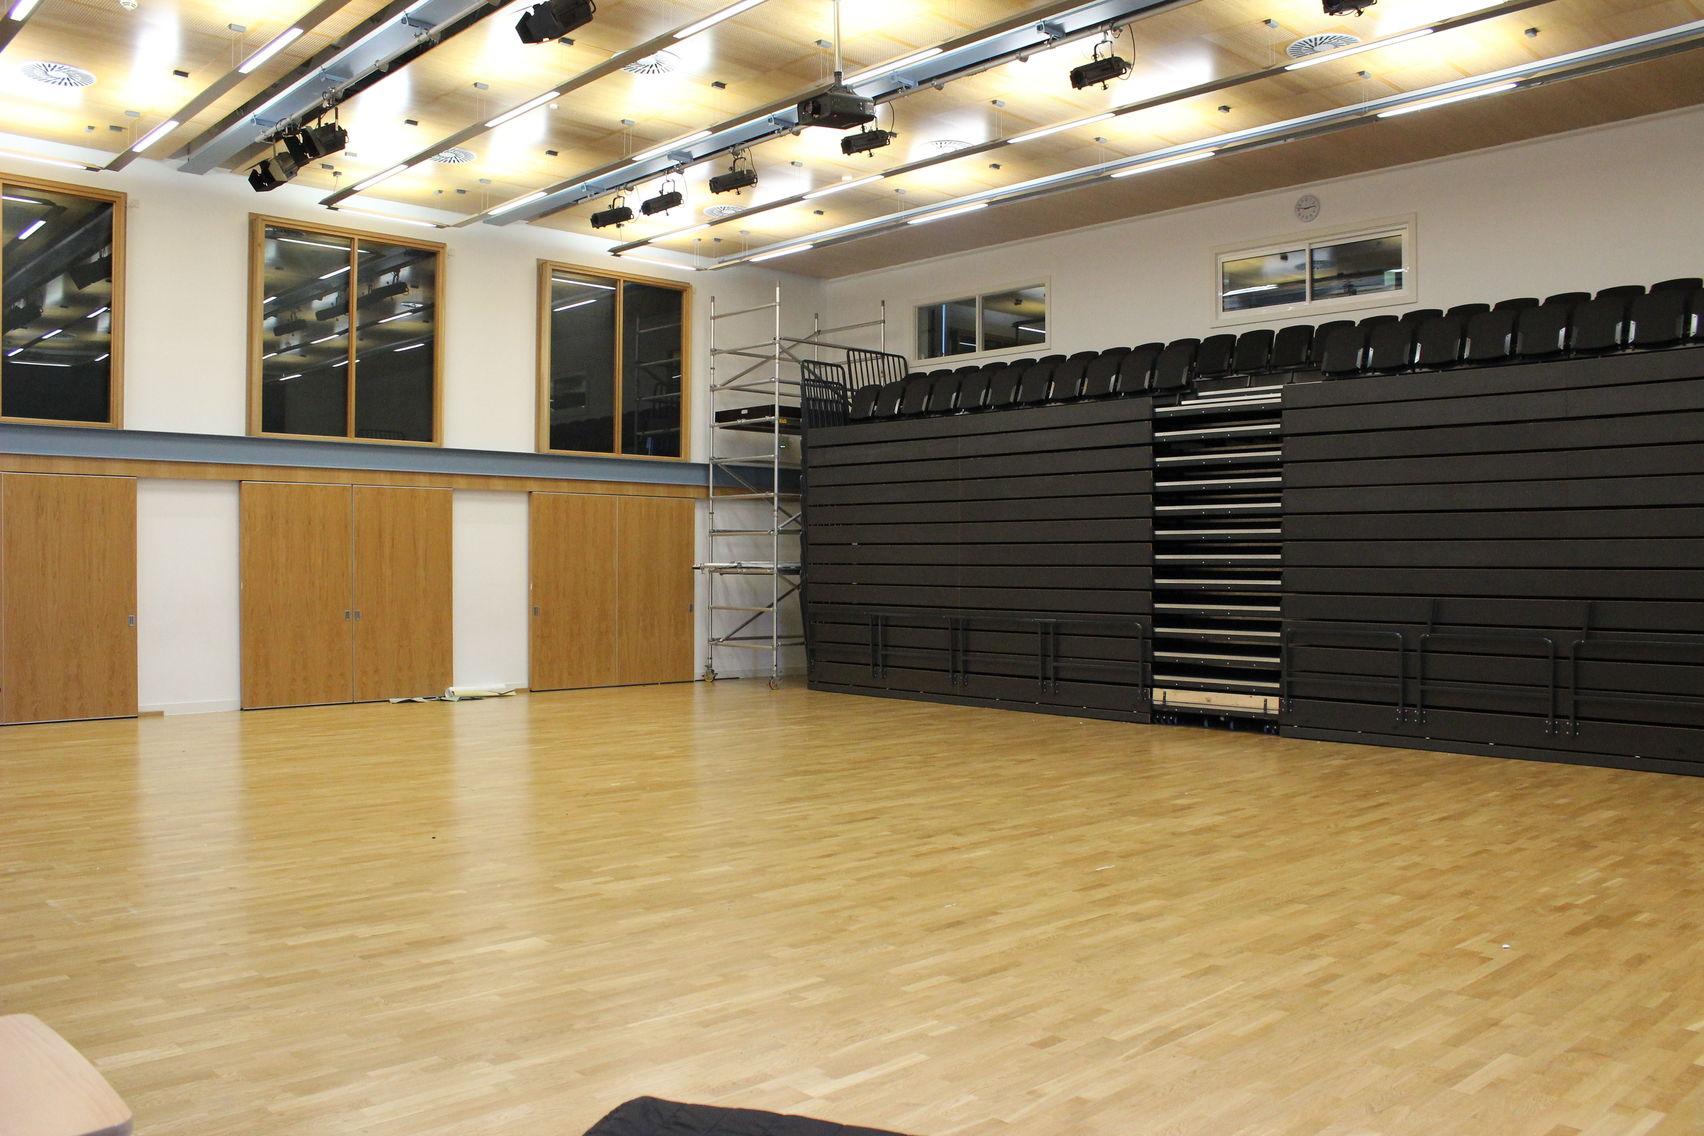 Halls, SLS at Wren Academy